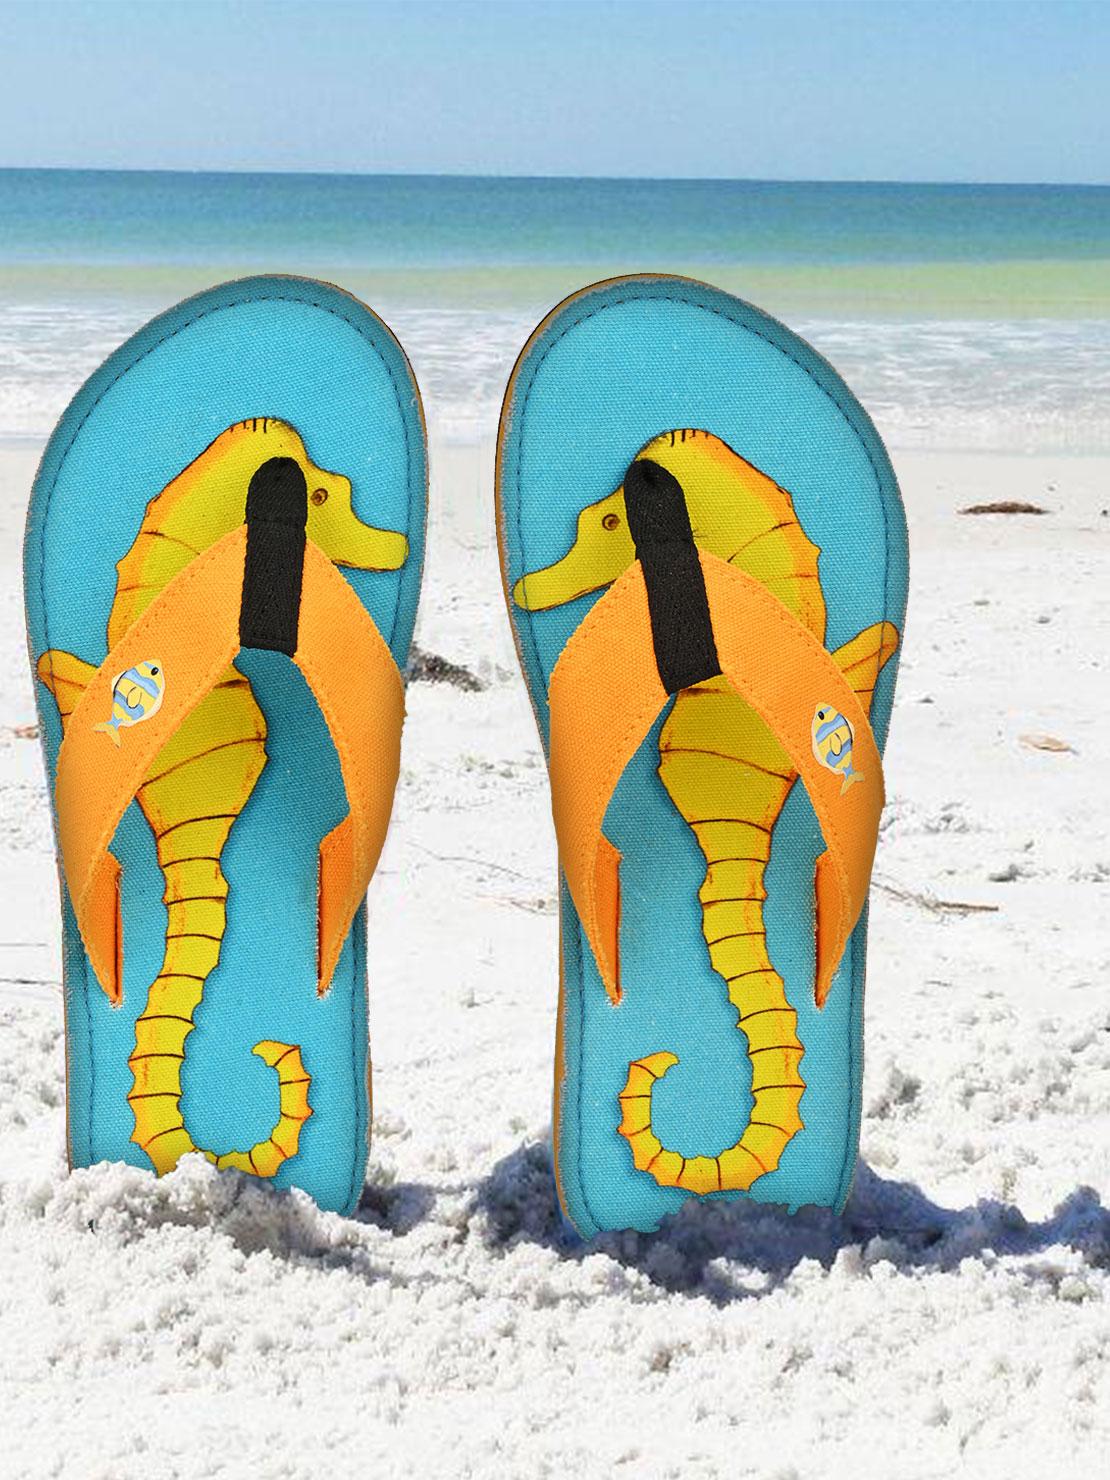 Beachcomber Blue Water | Beachcomber Blue Water  Seahorses Unisex Canvas Flip Flops